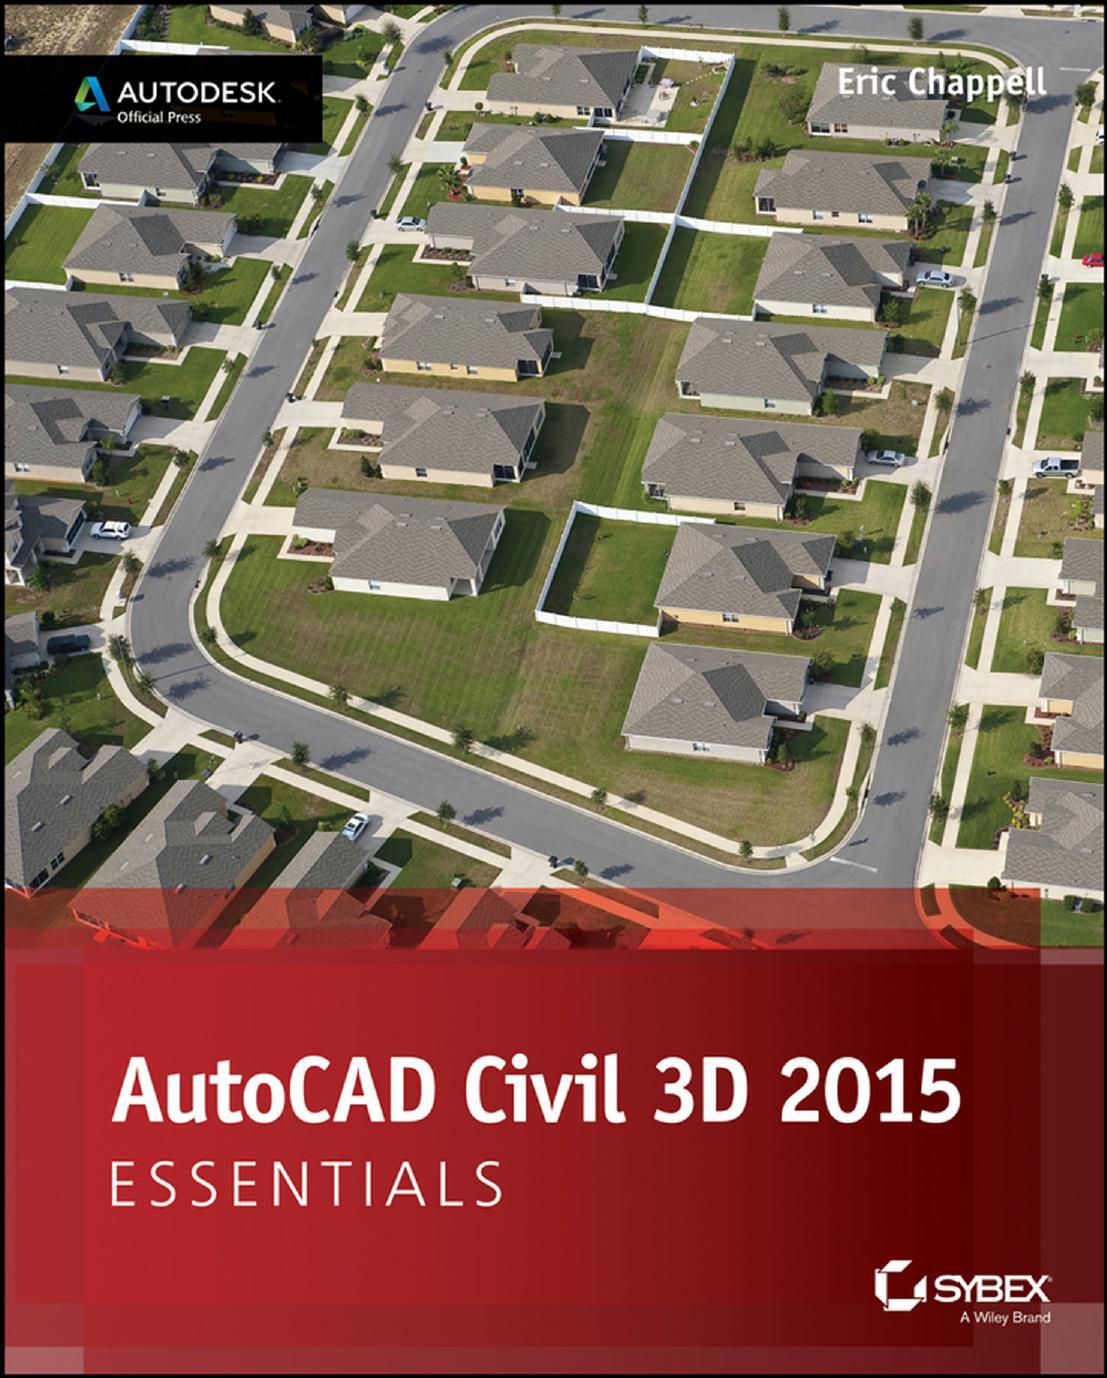 AutoCAD Civil 3D 2015 - Essentials